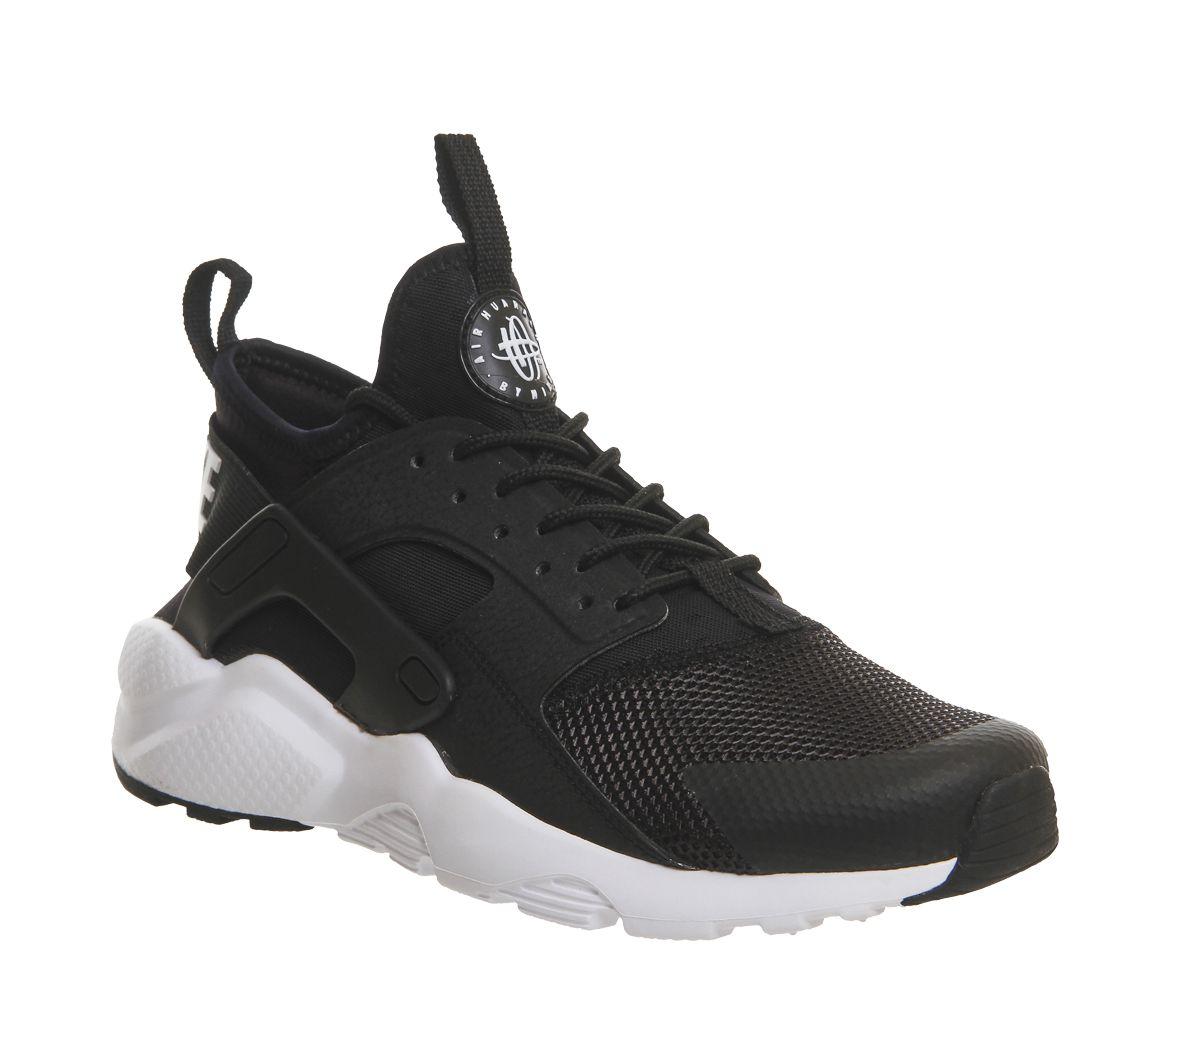 428a7ecc9b53f Nike Huarache Ultra Black White - Unisex